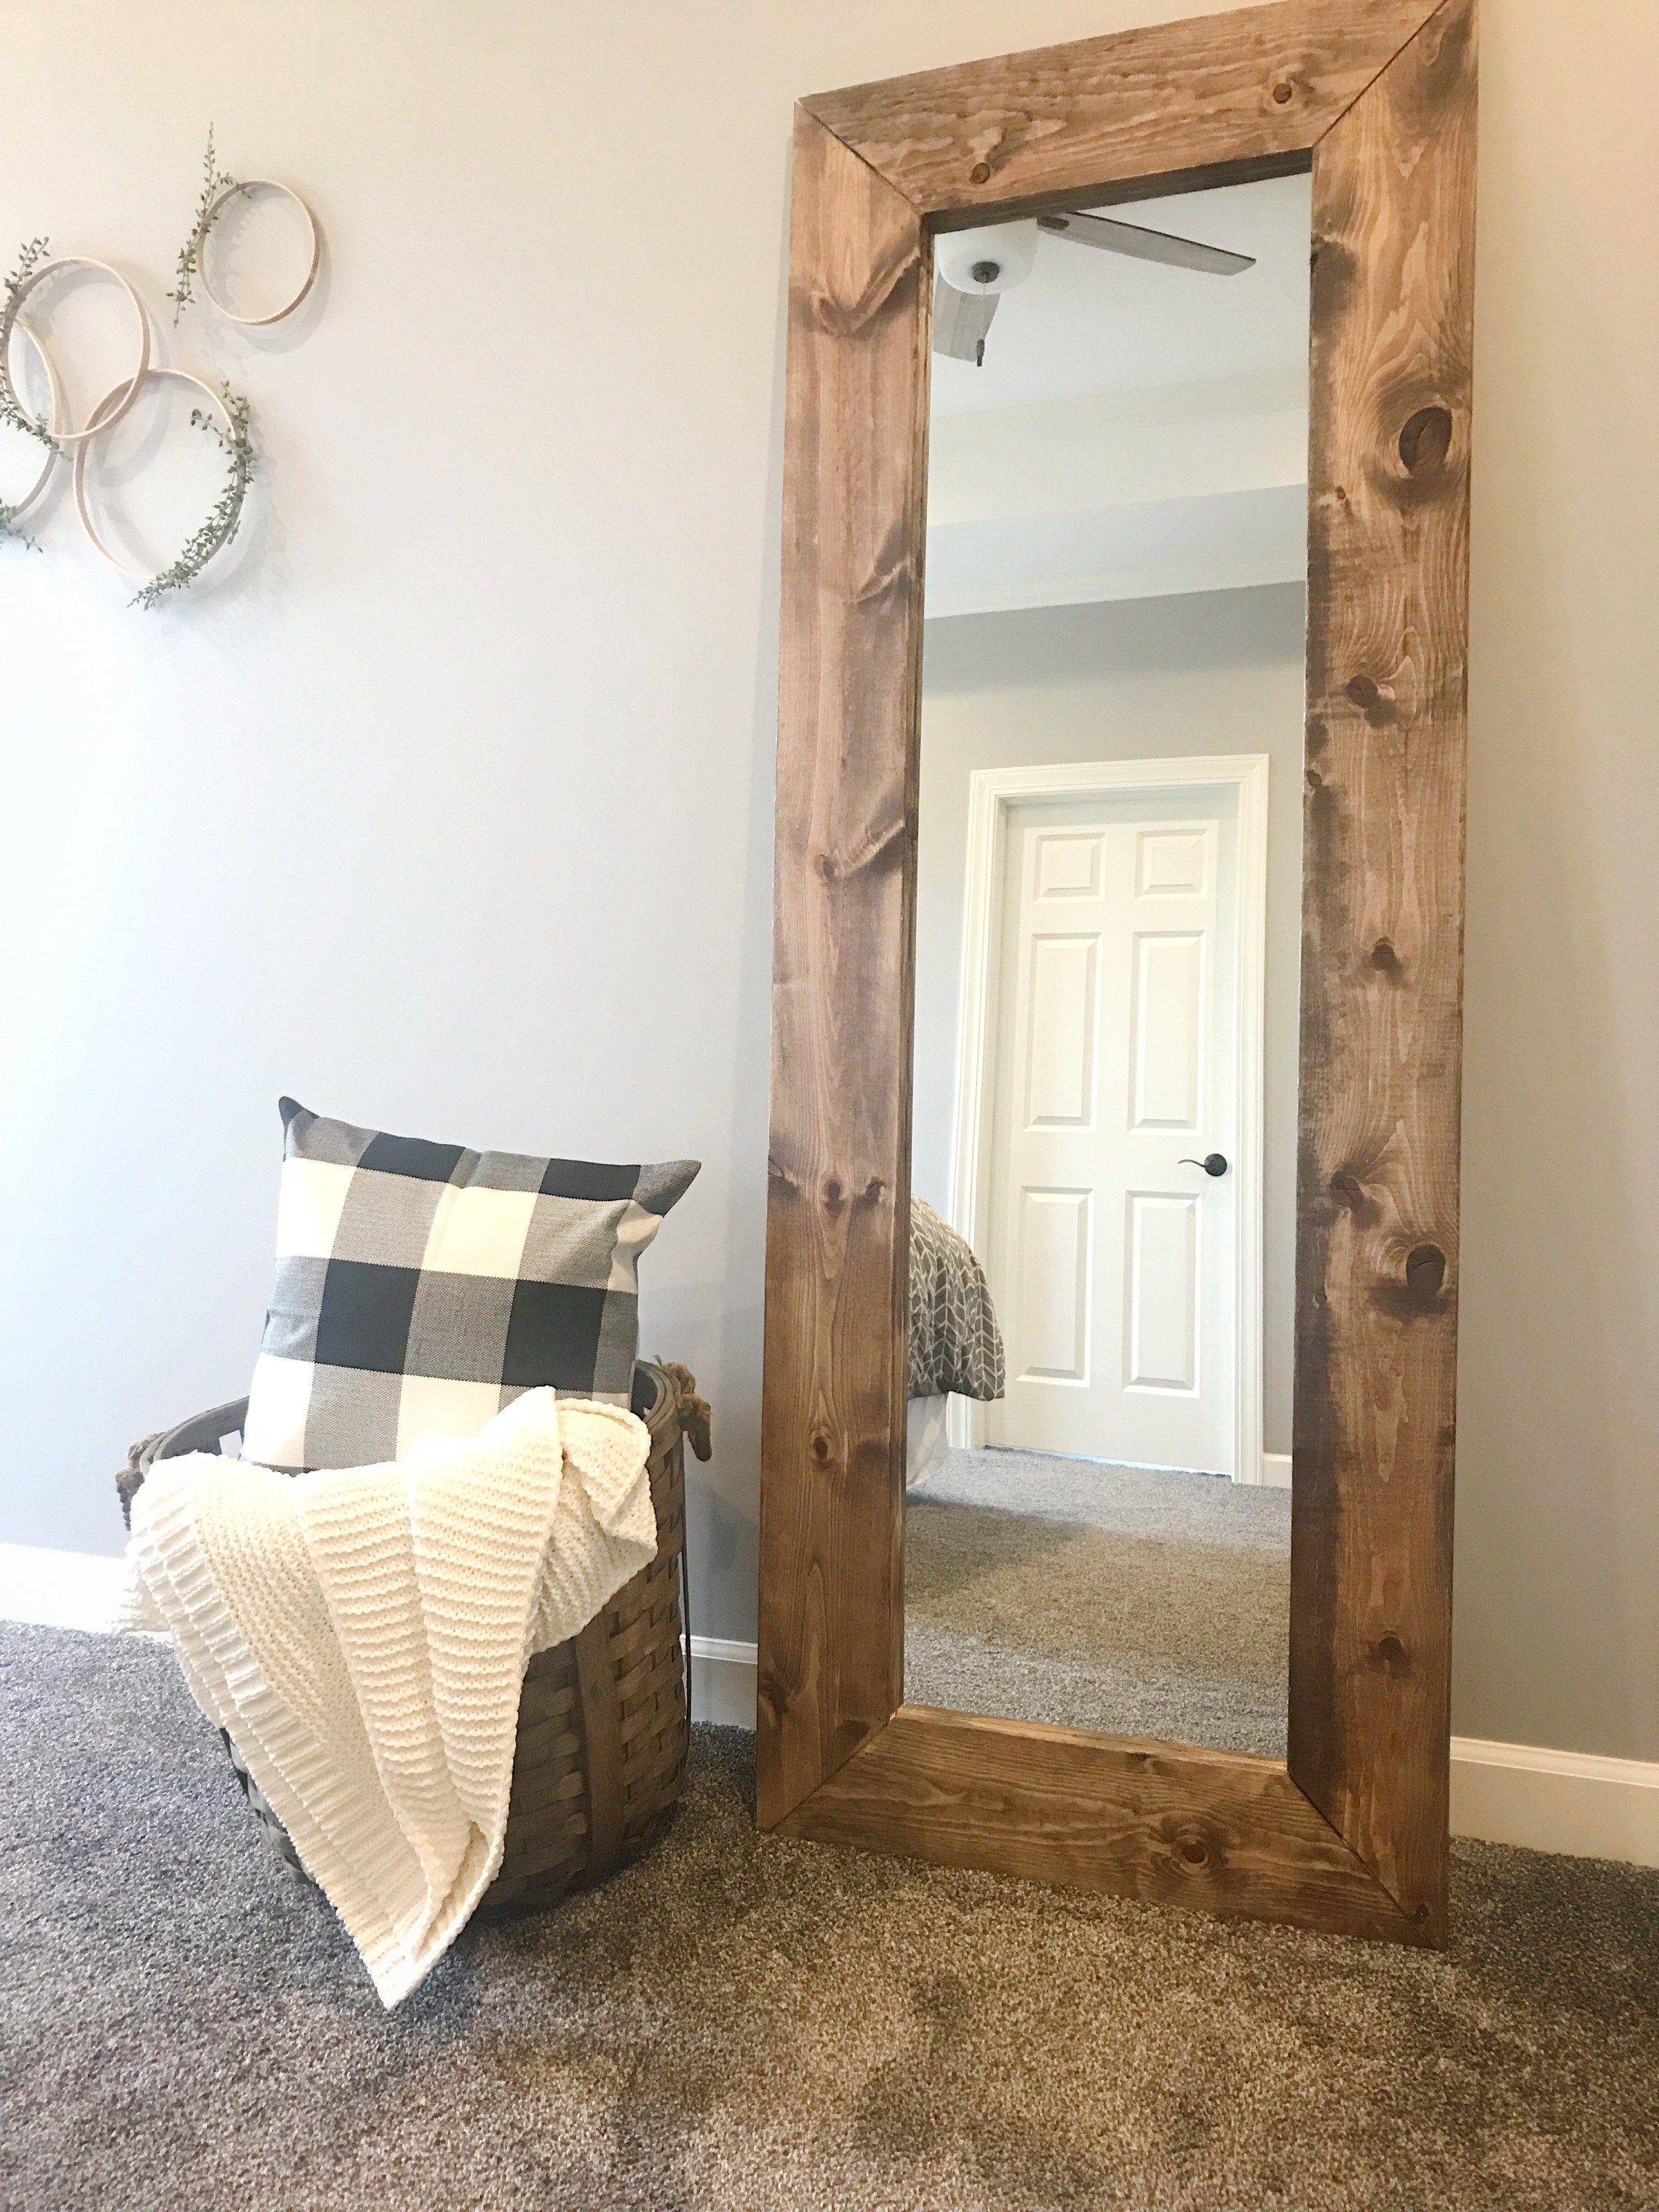 How to Build a DIY Wood Mirror Frame | I\'m home | DIY, Wood framed ...